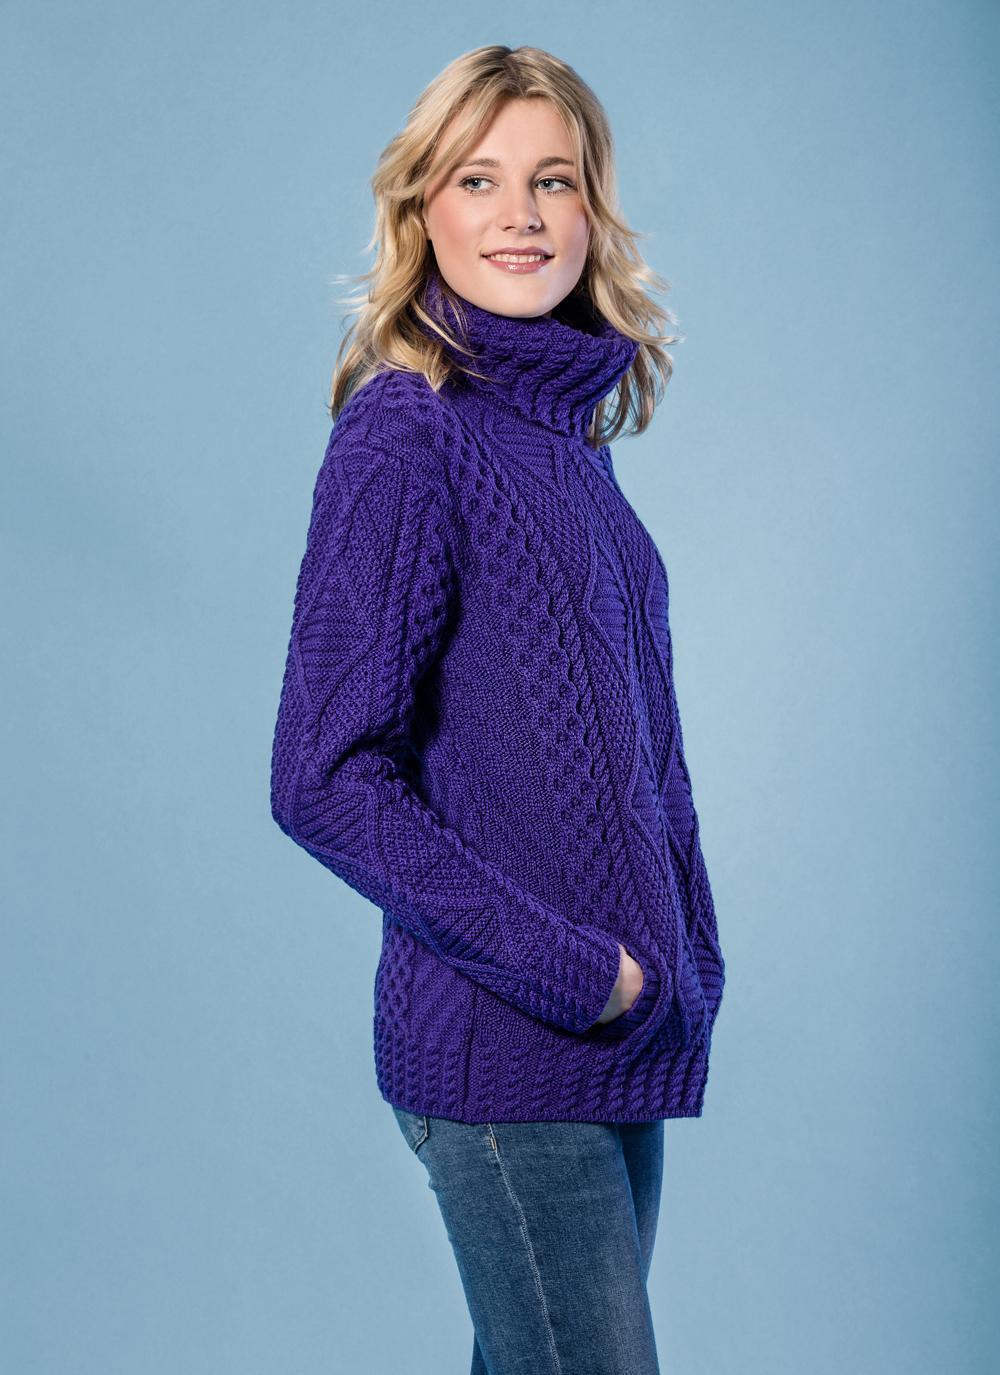 Una Cowl Neck Aran Sweater | Blarney